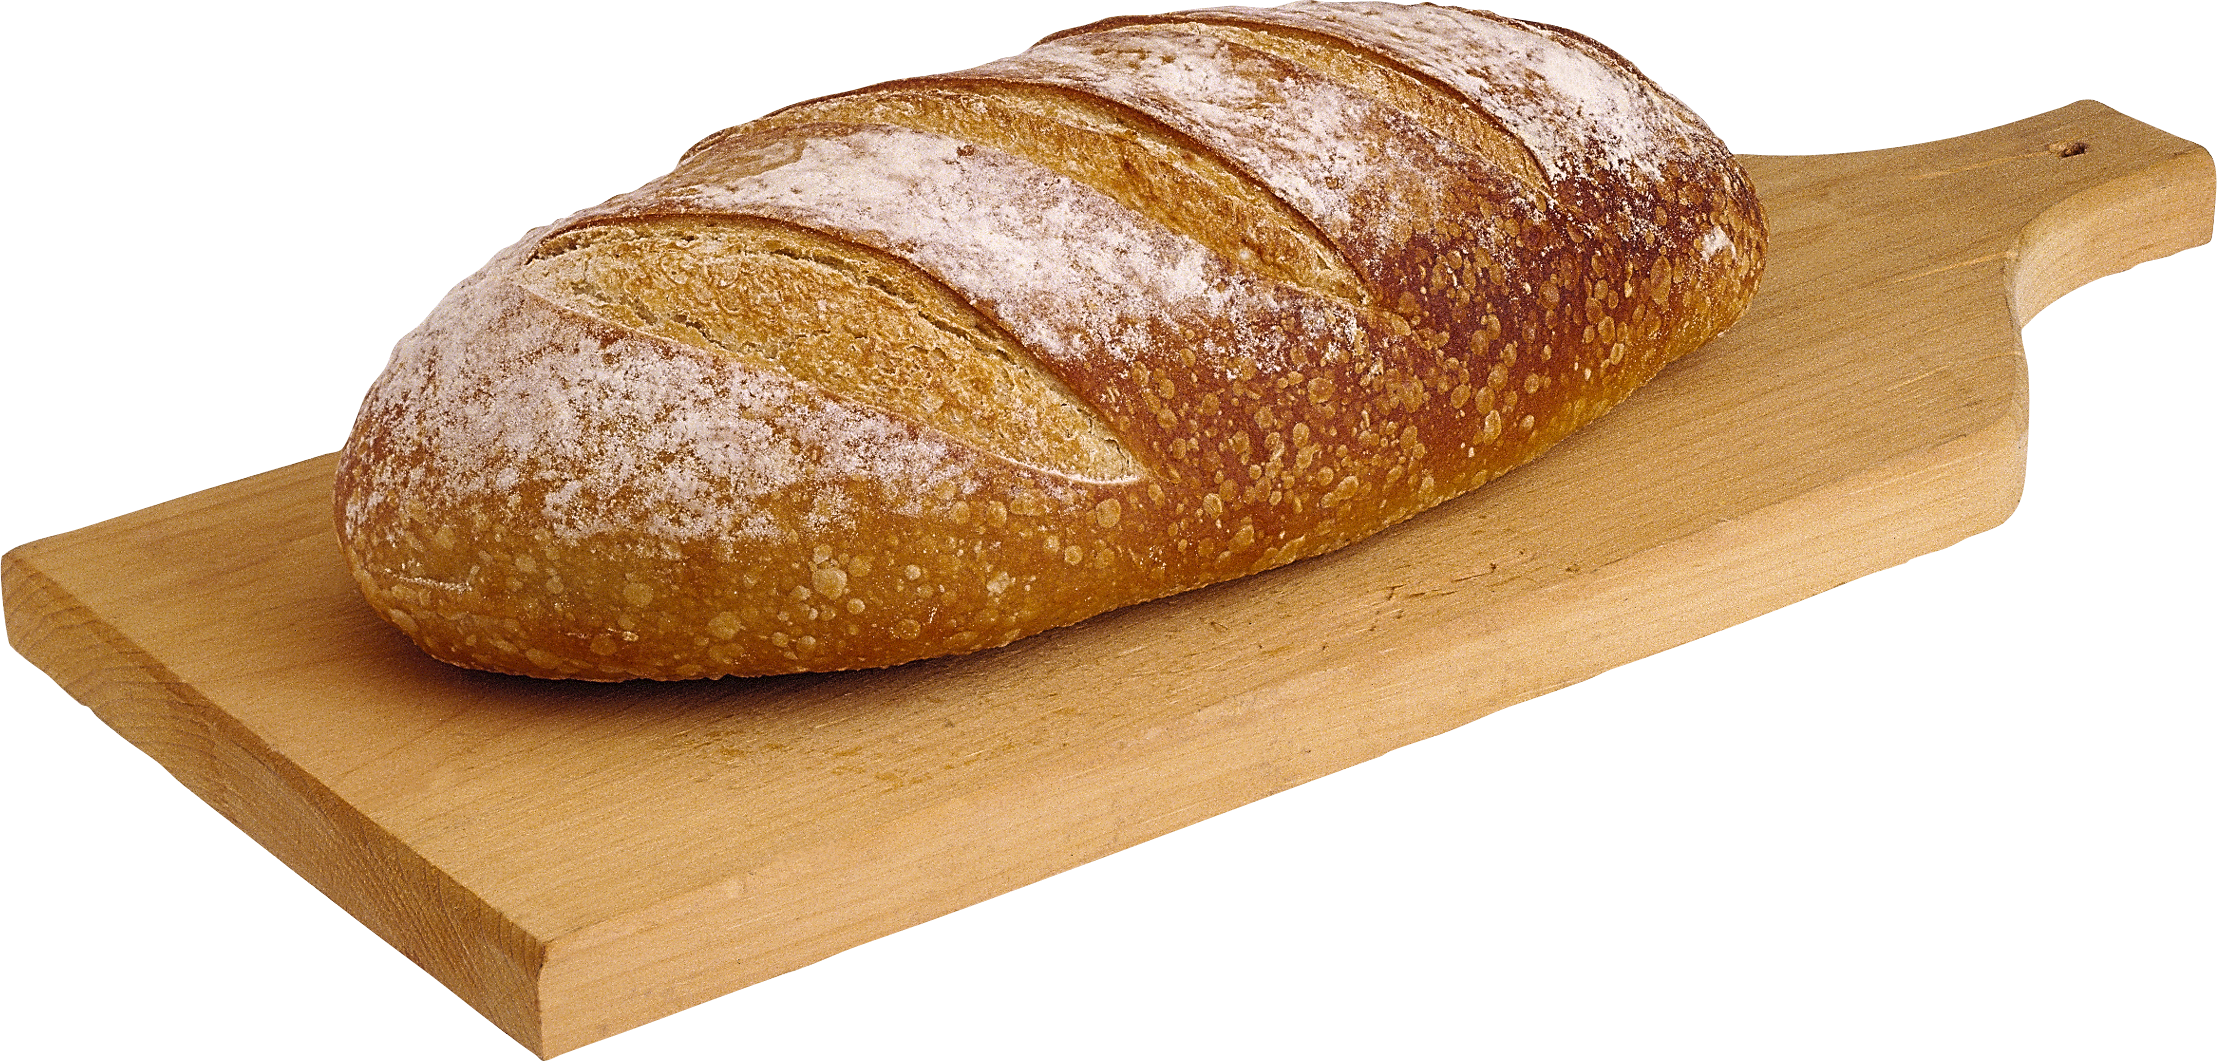 Bread HD PNG - 93335